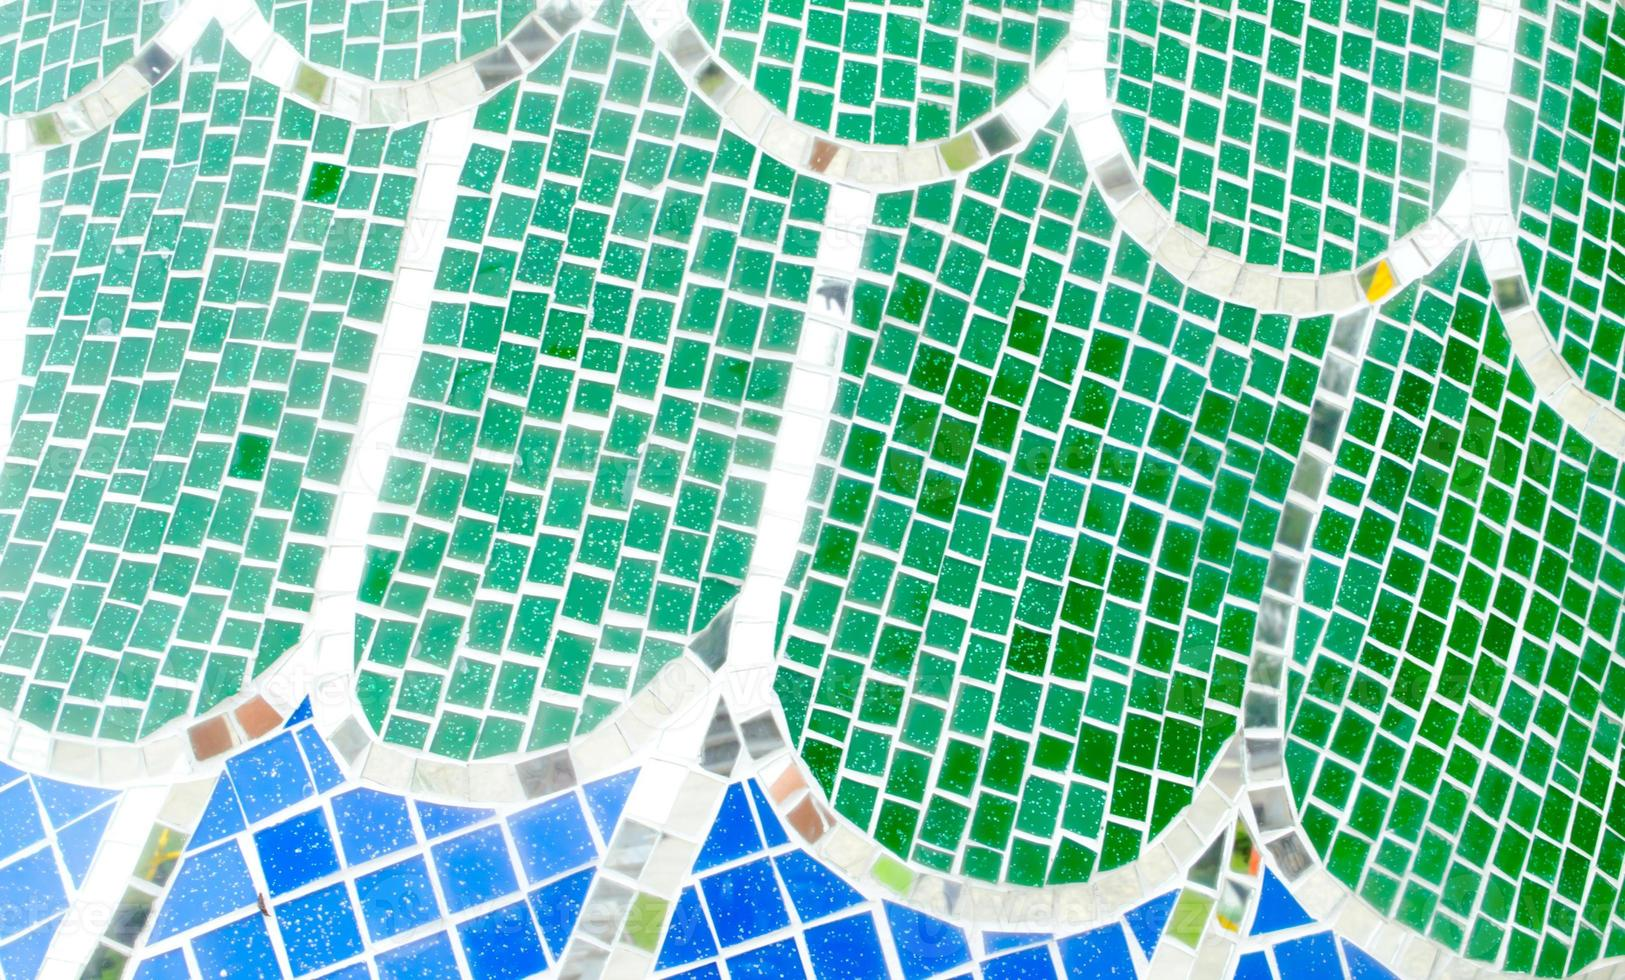 kleurrijk mozaïek foto